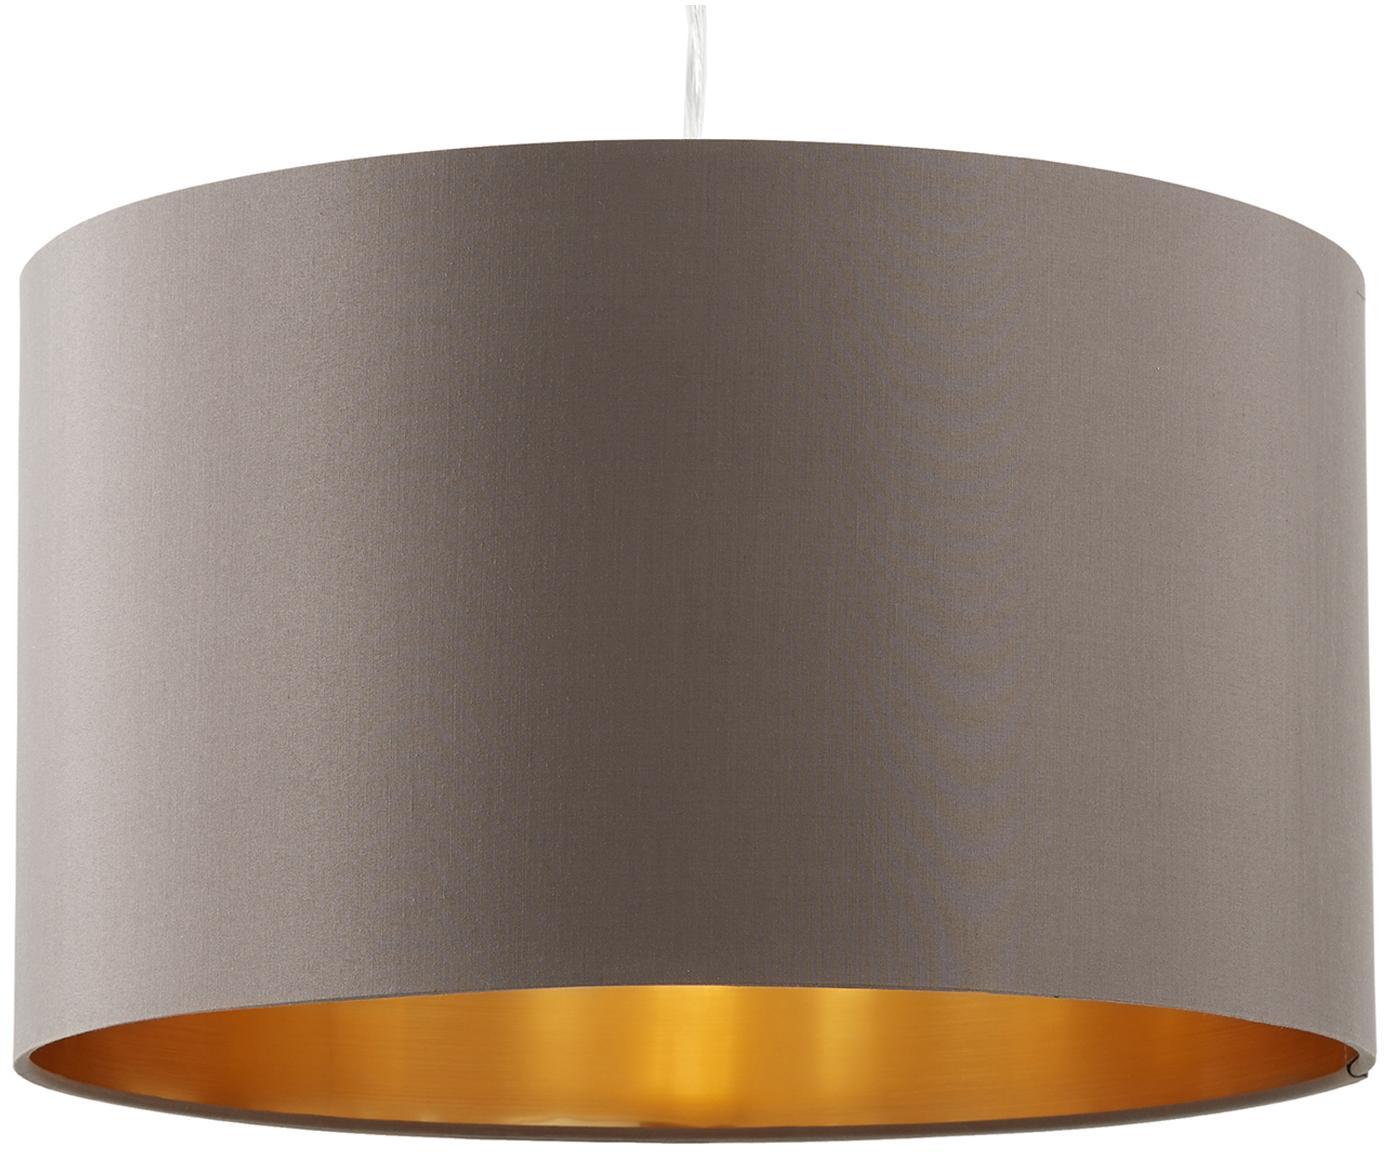 Lampada a sospensione Jamie, Baldacchino: metallo nichelato, Argento, grigio-beige, Ø 38 x Alt. 23 cm